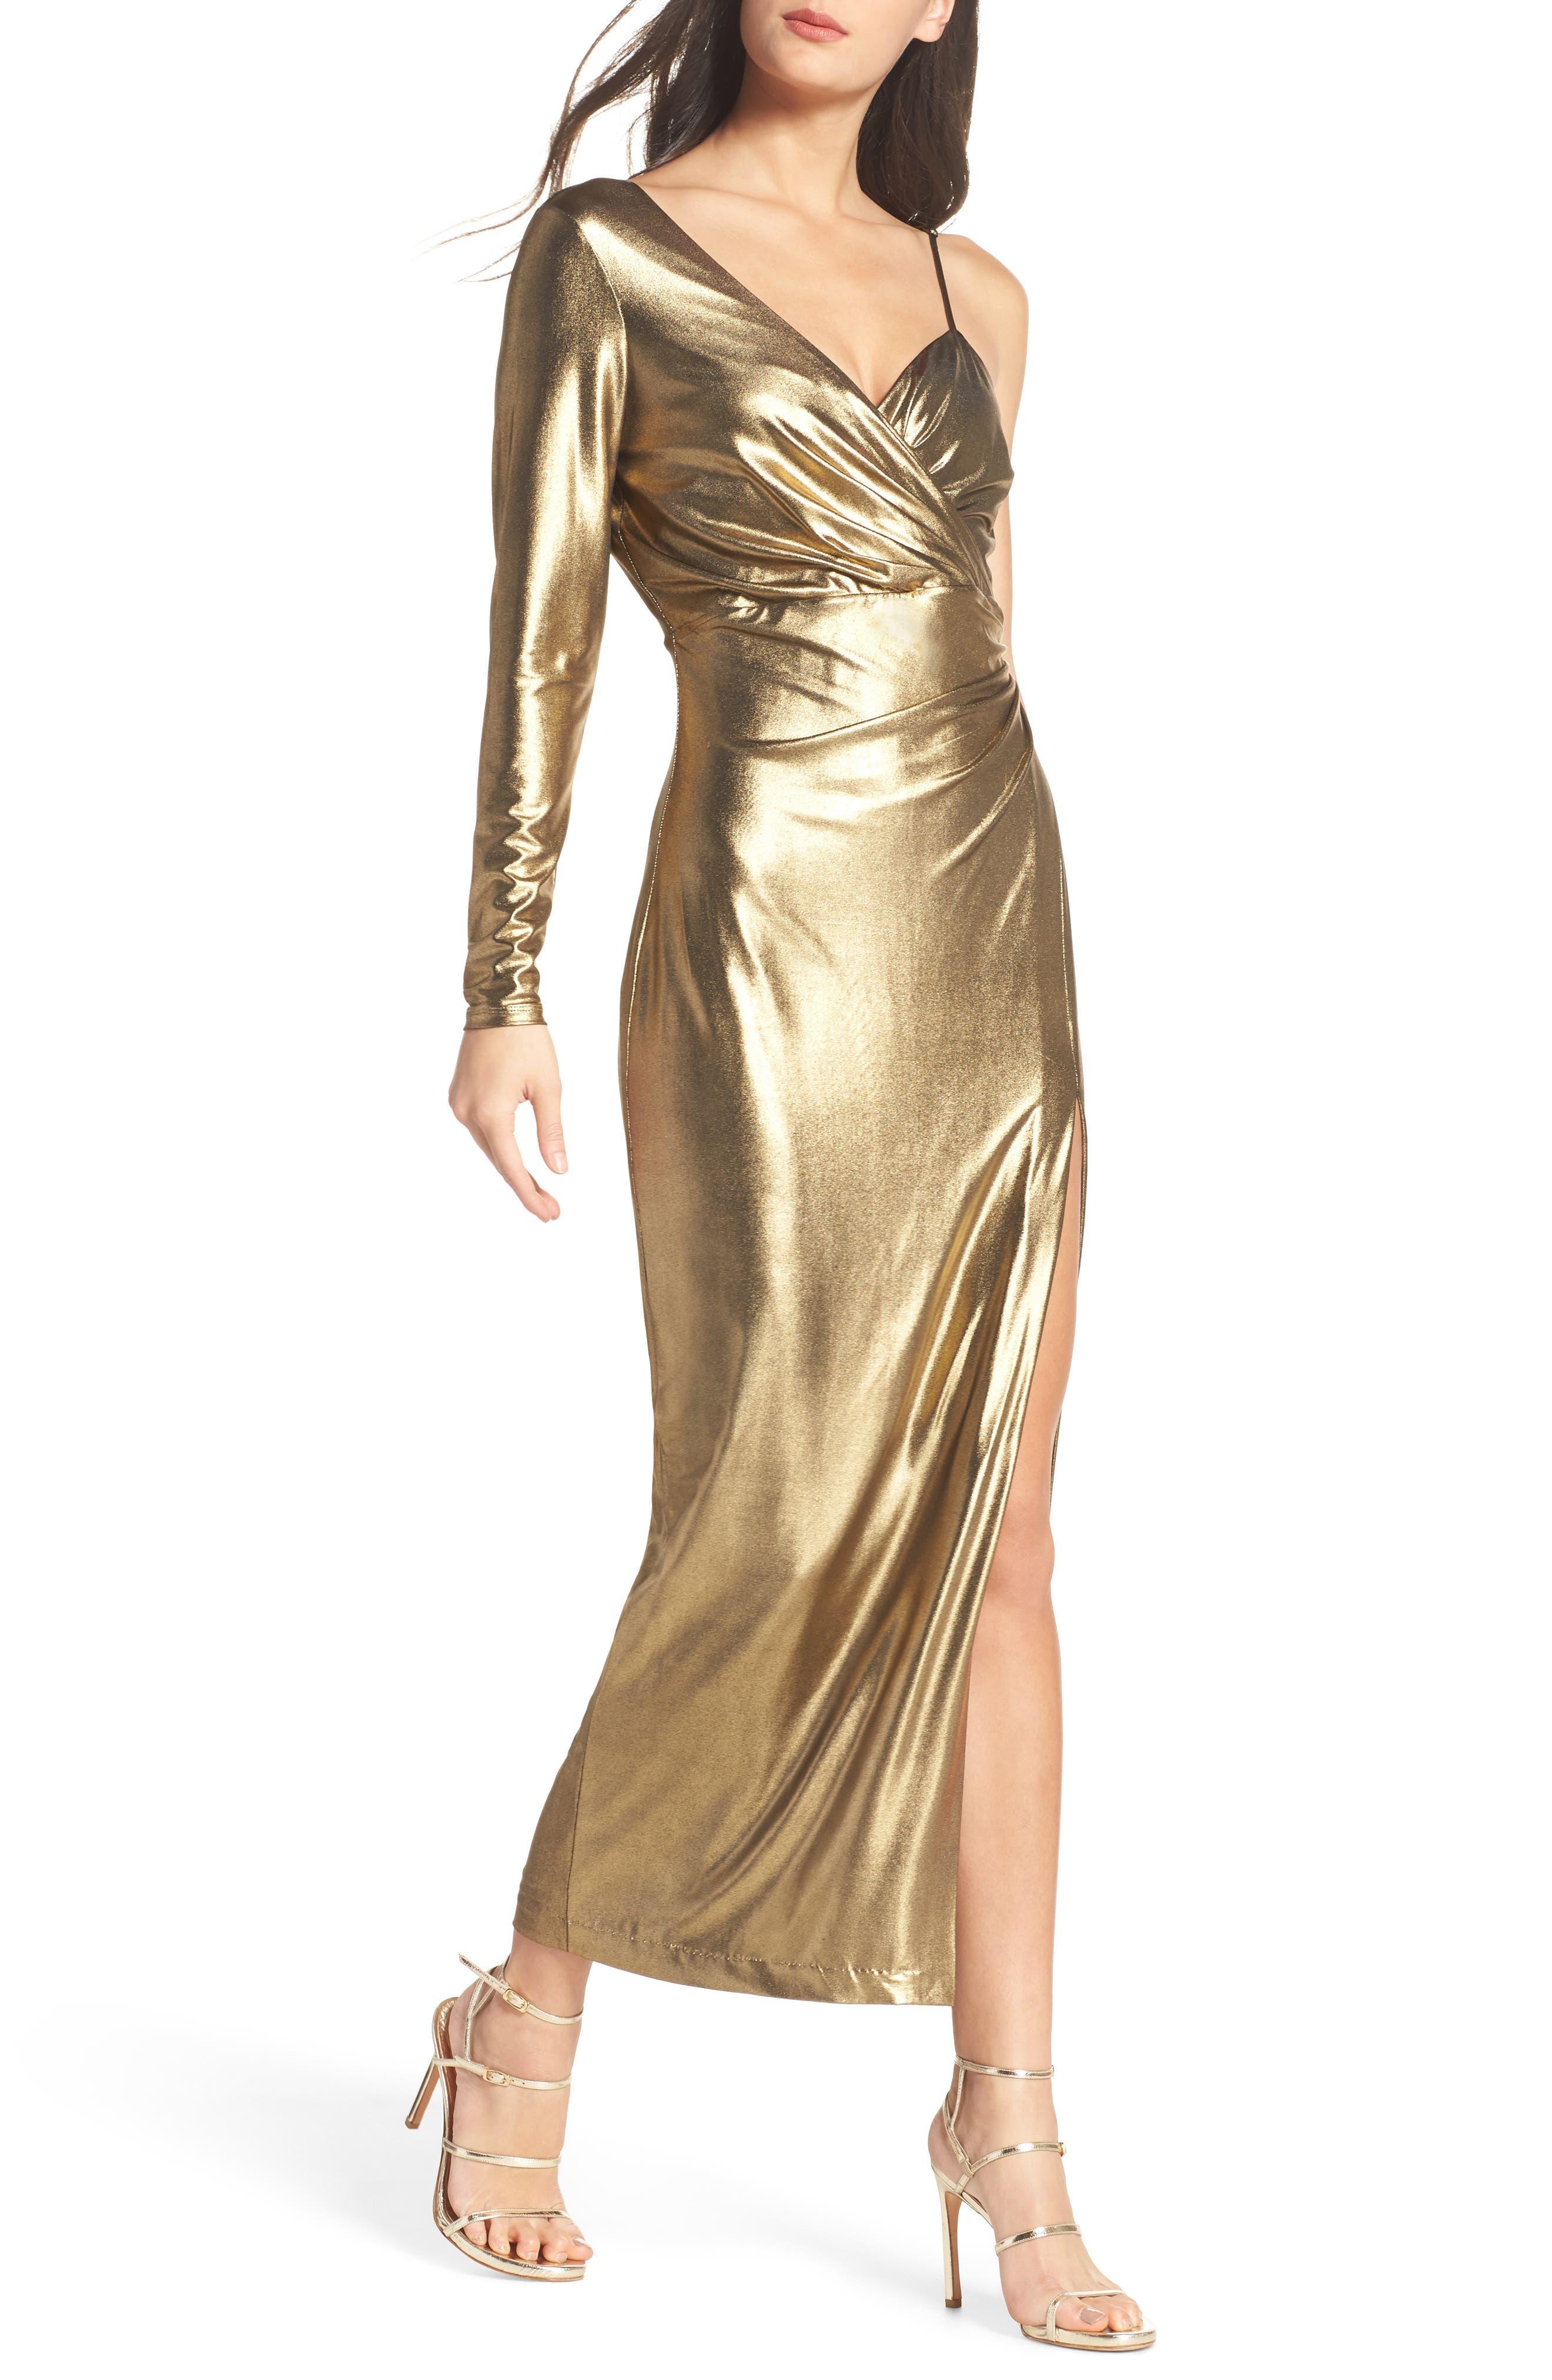 Aurel Metallic Dress,                             Main thumbnail 1, color,